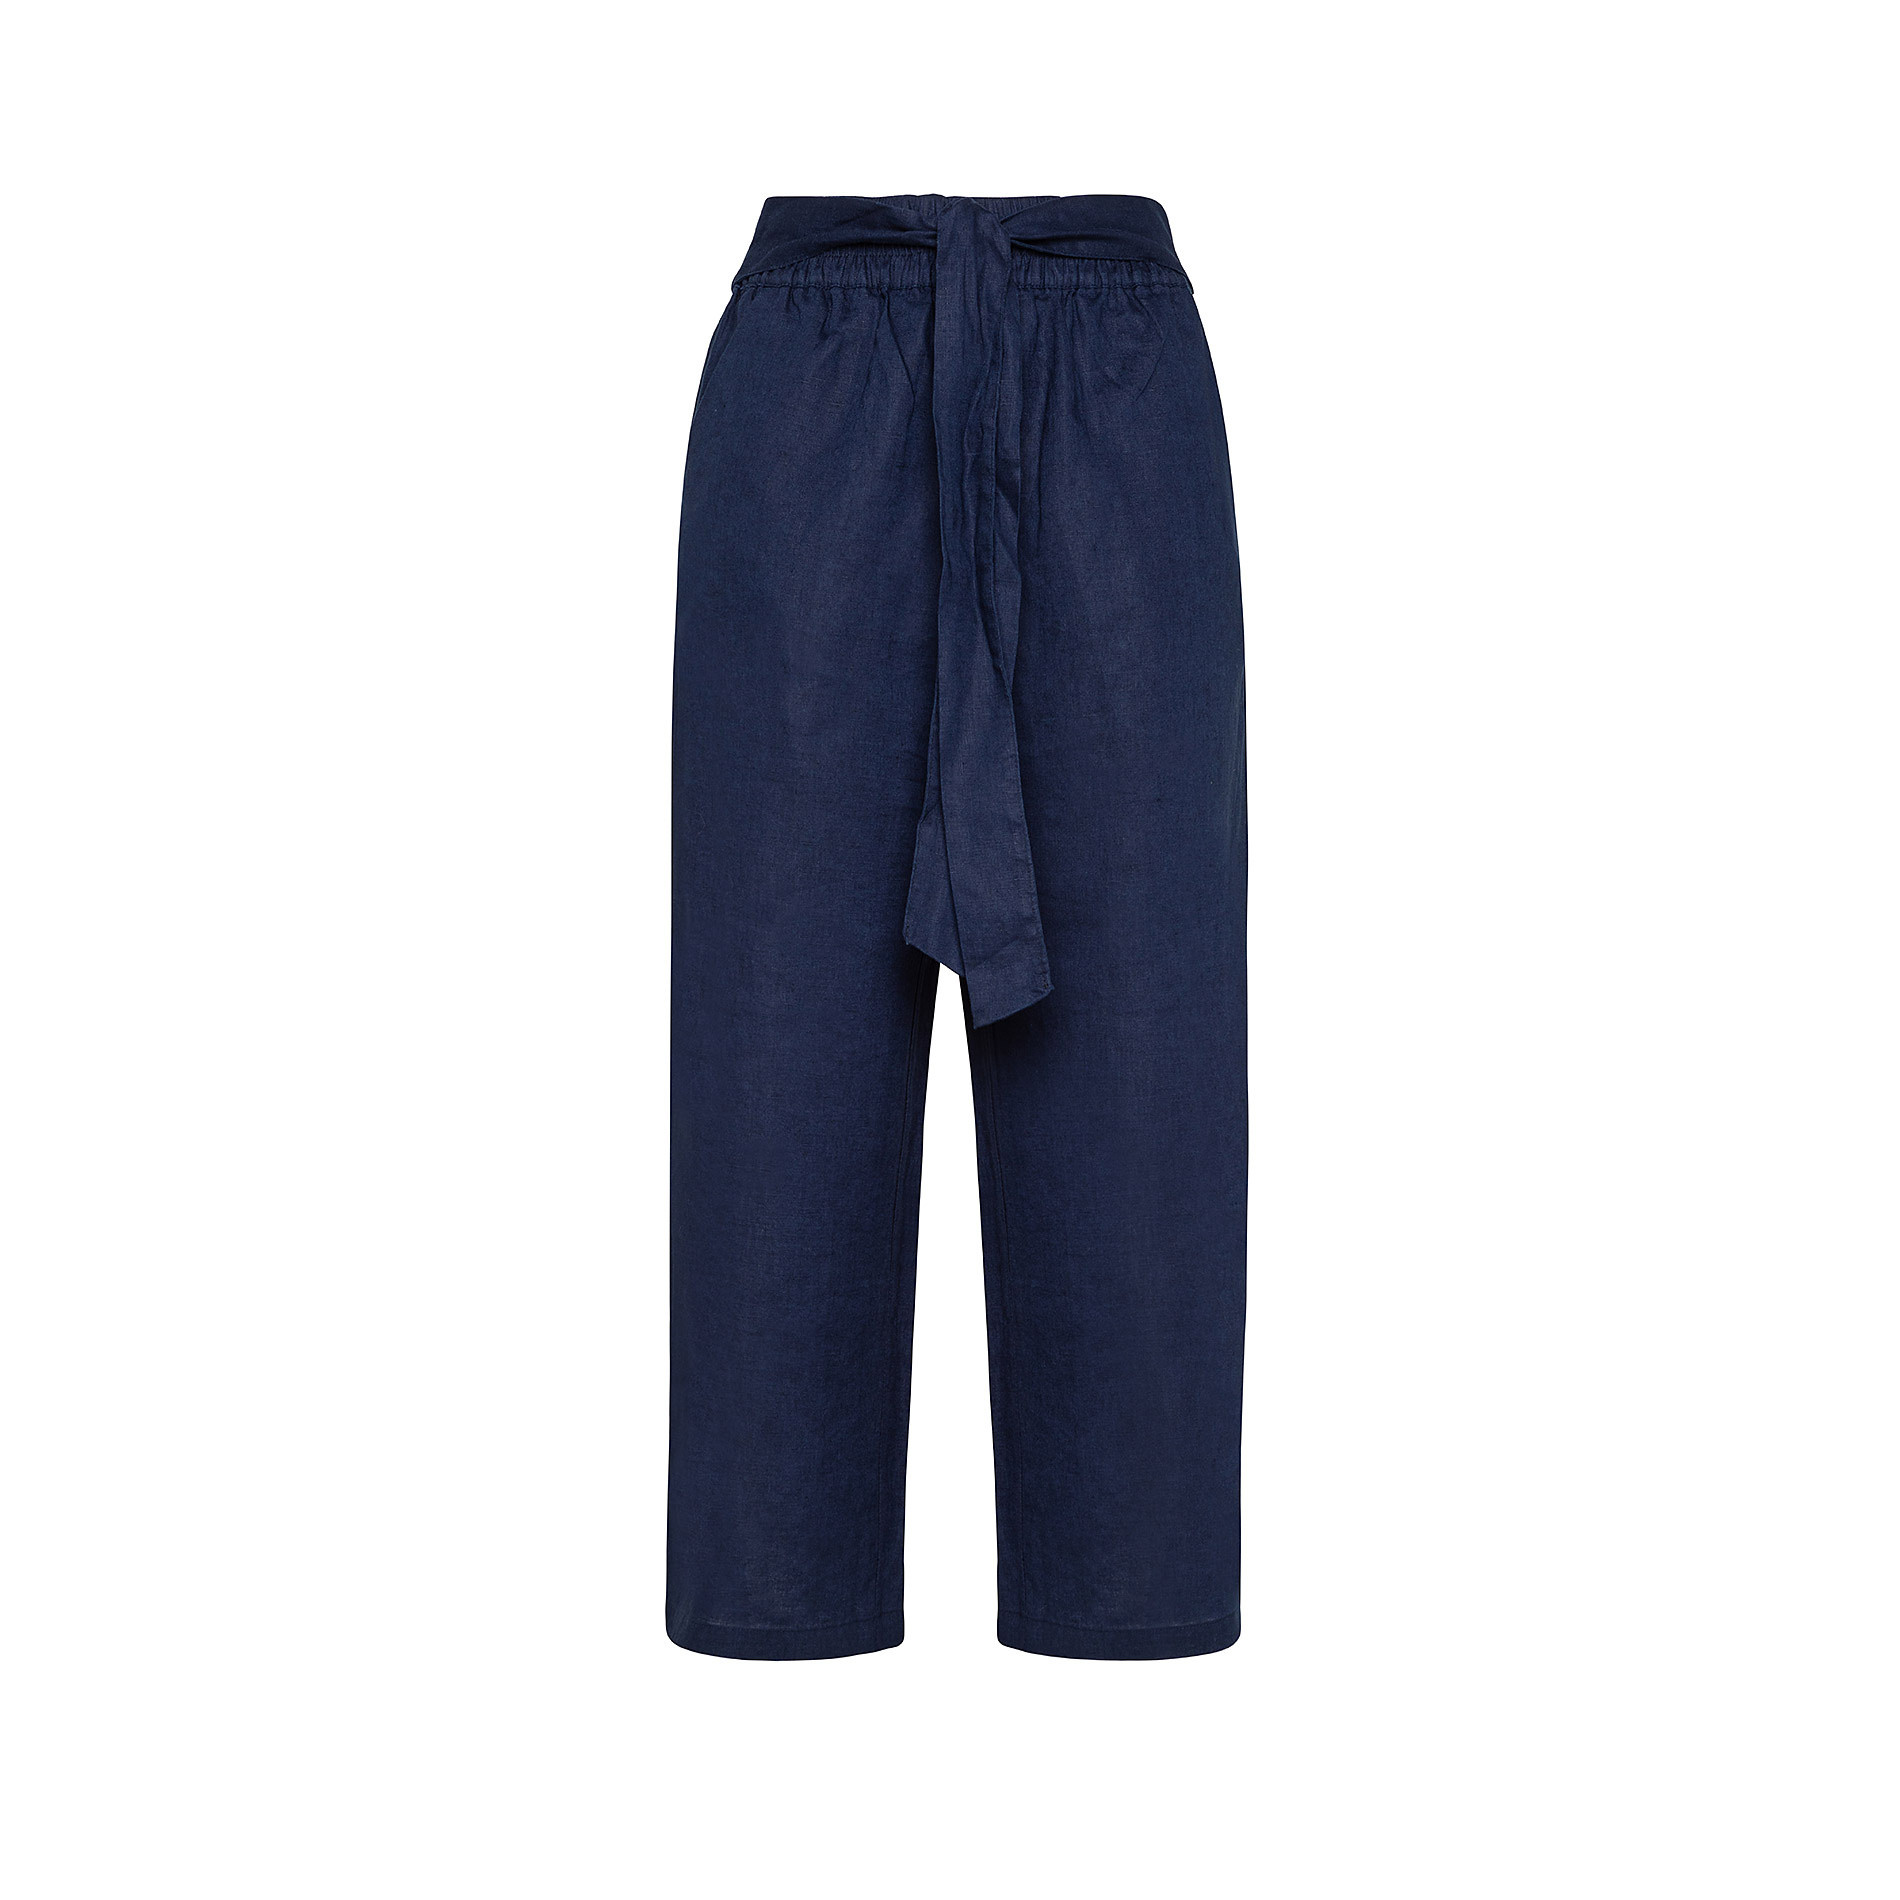 Pantalone puro lino con fusciacca Koan, Blu scuro, large image number 1